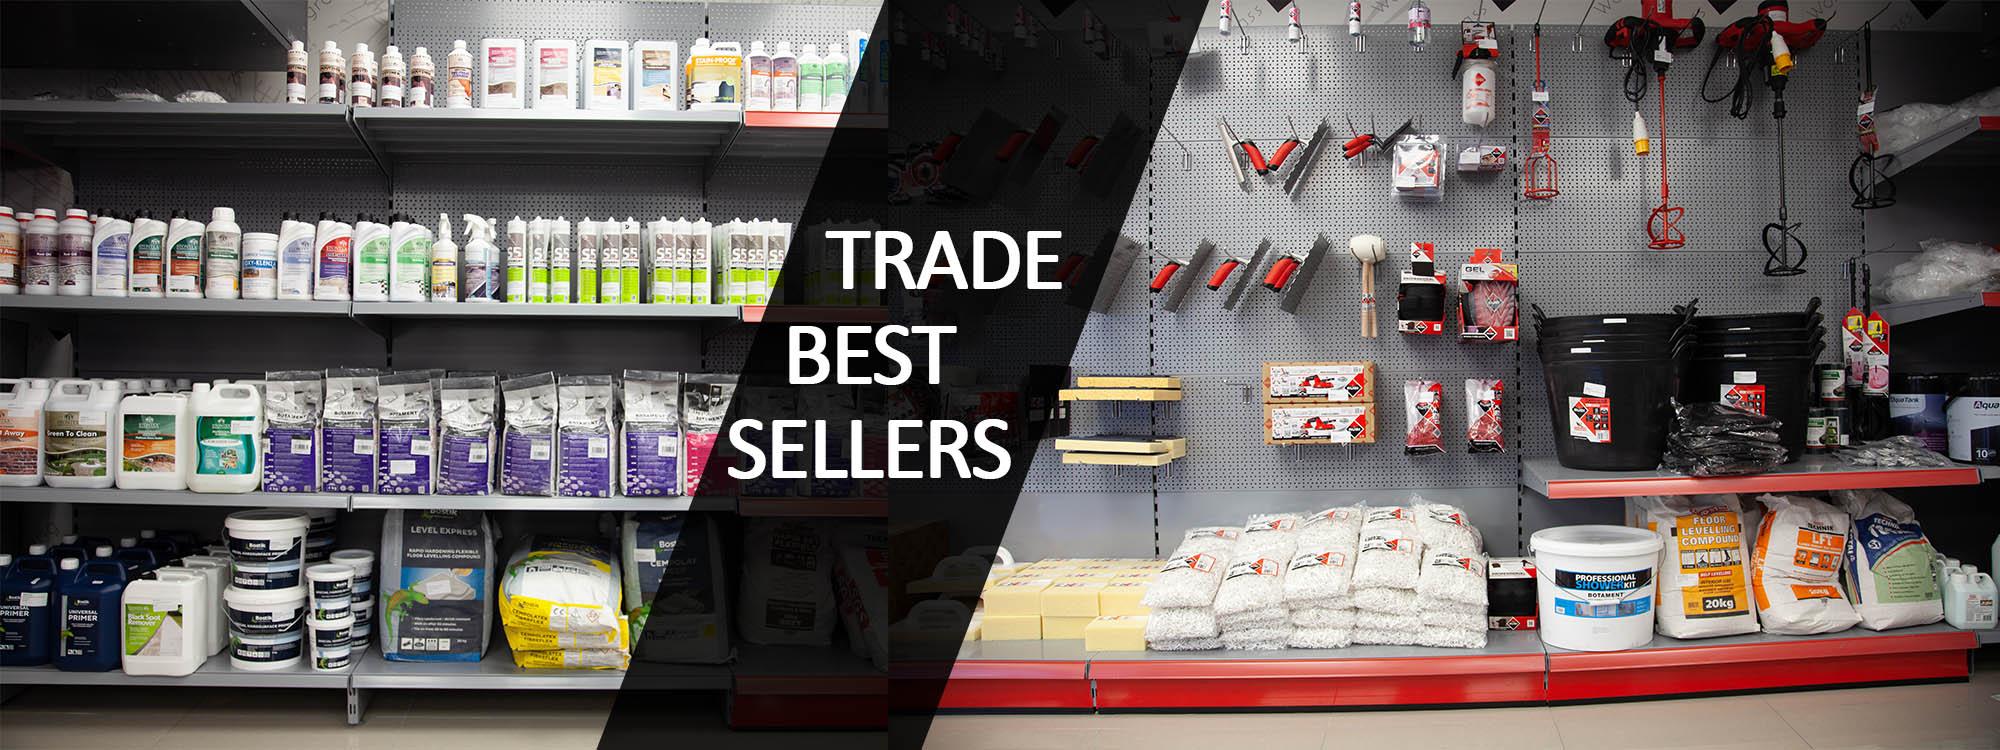 Trade - Best Sellers